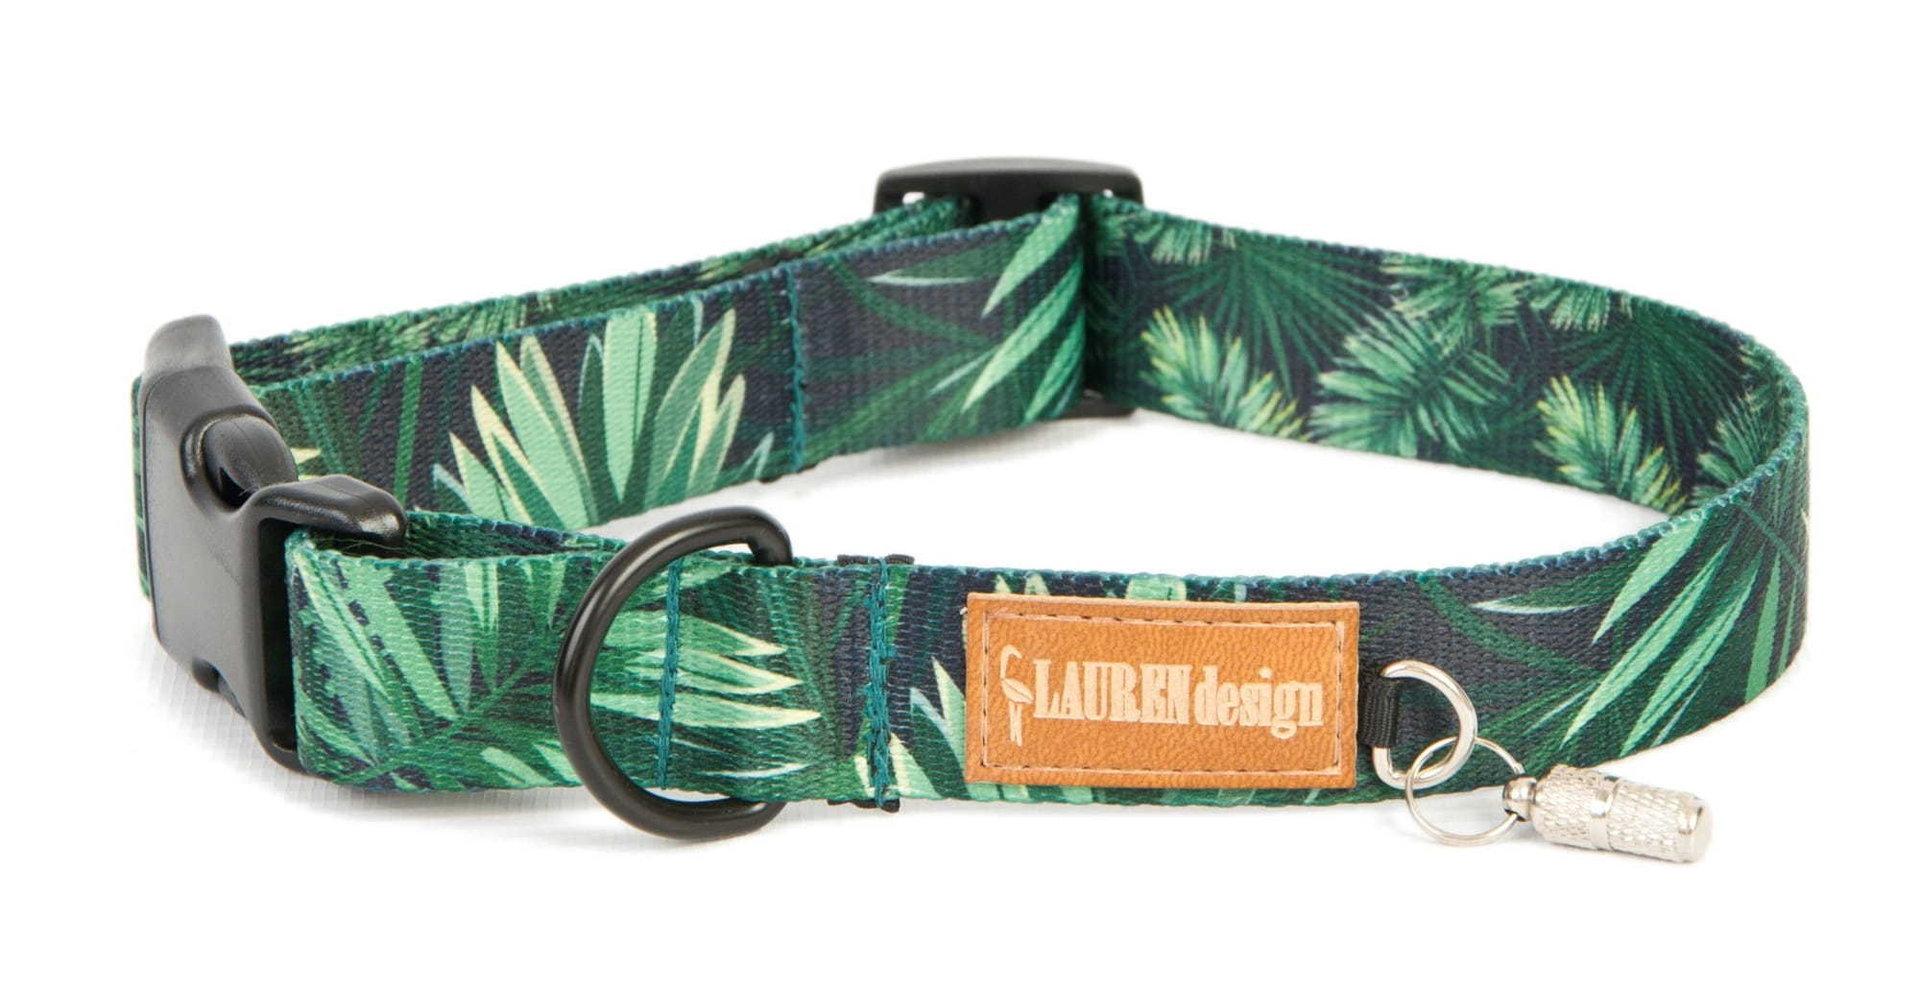 Halsband, grün, S - XL